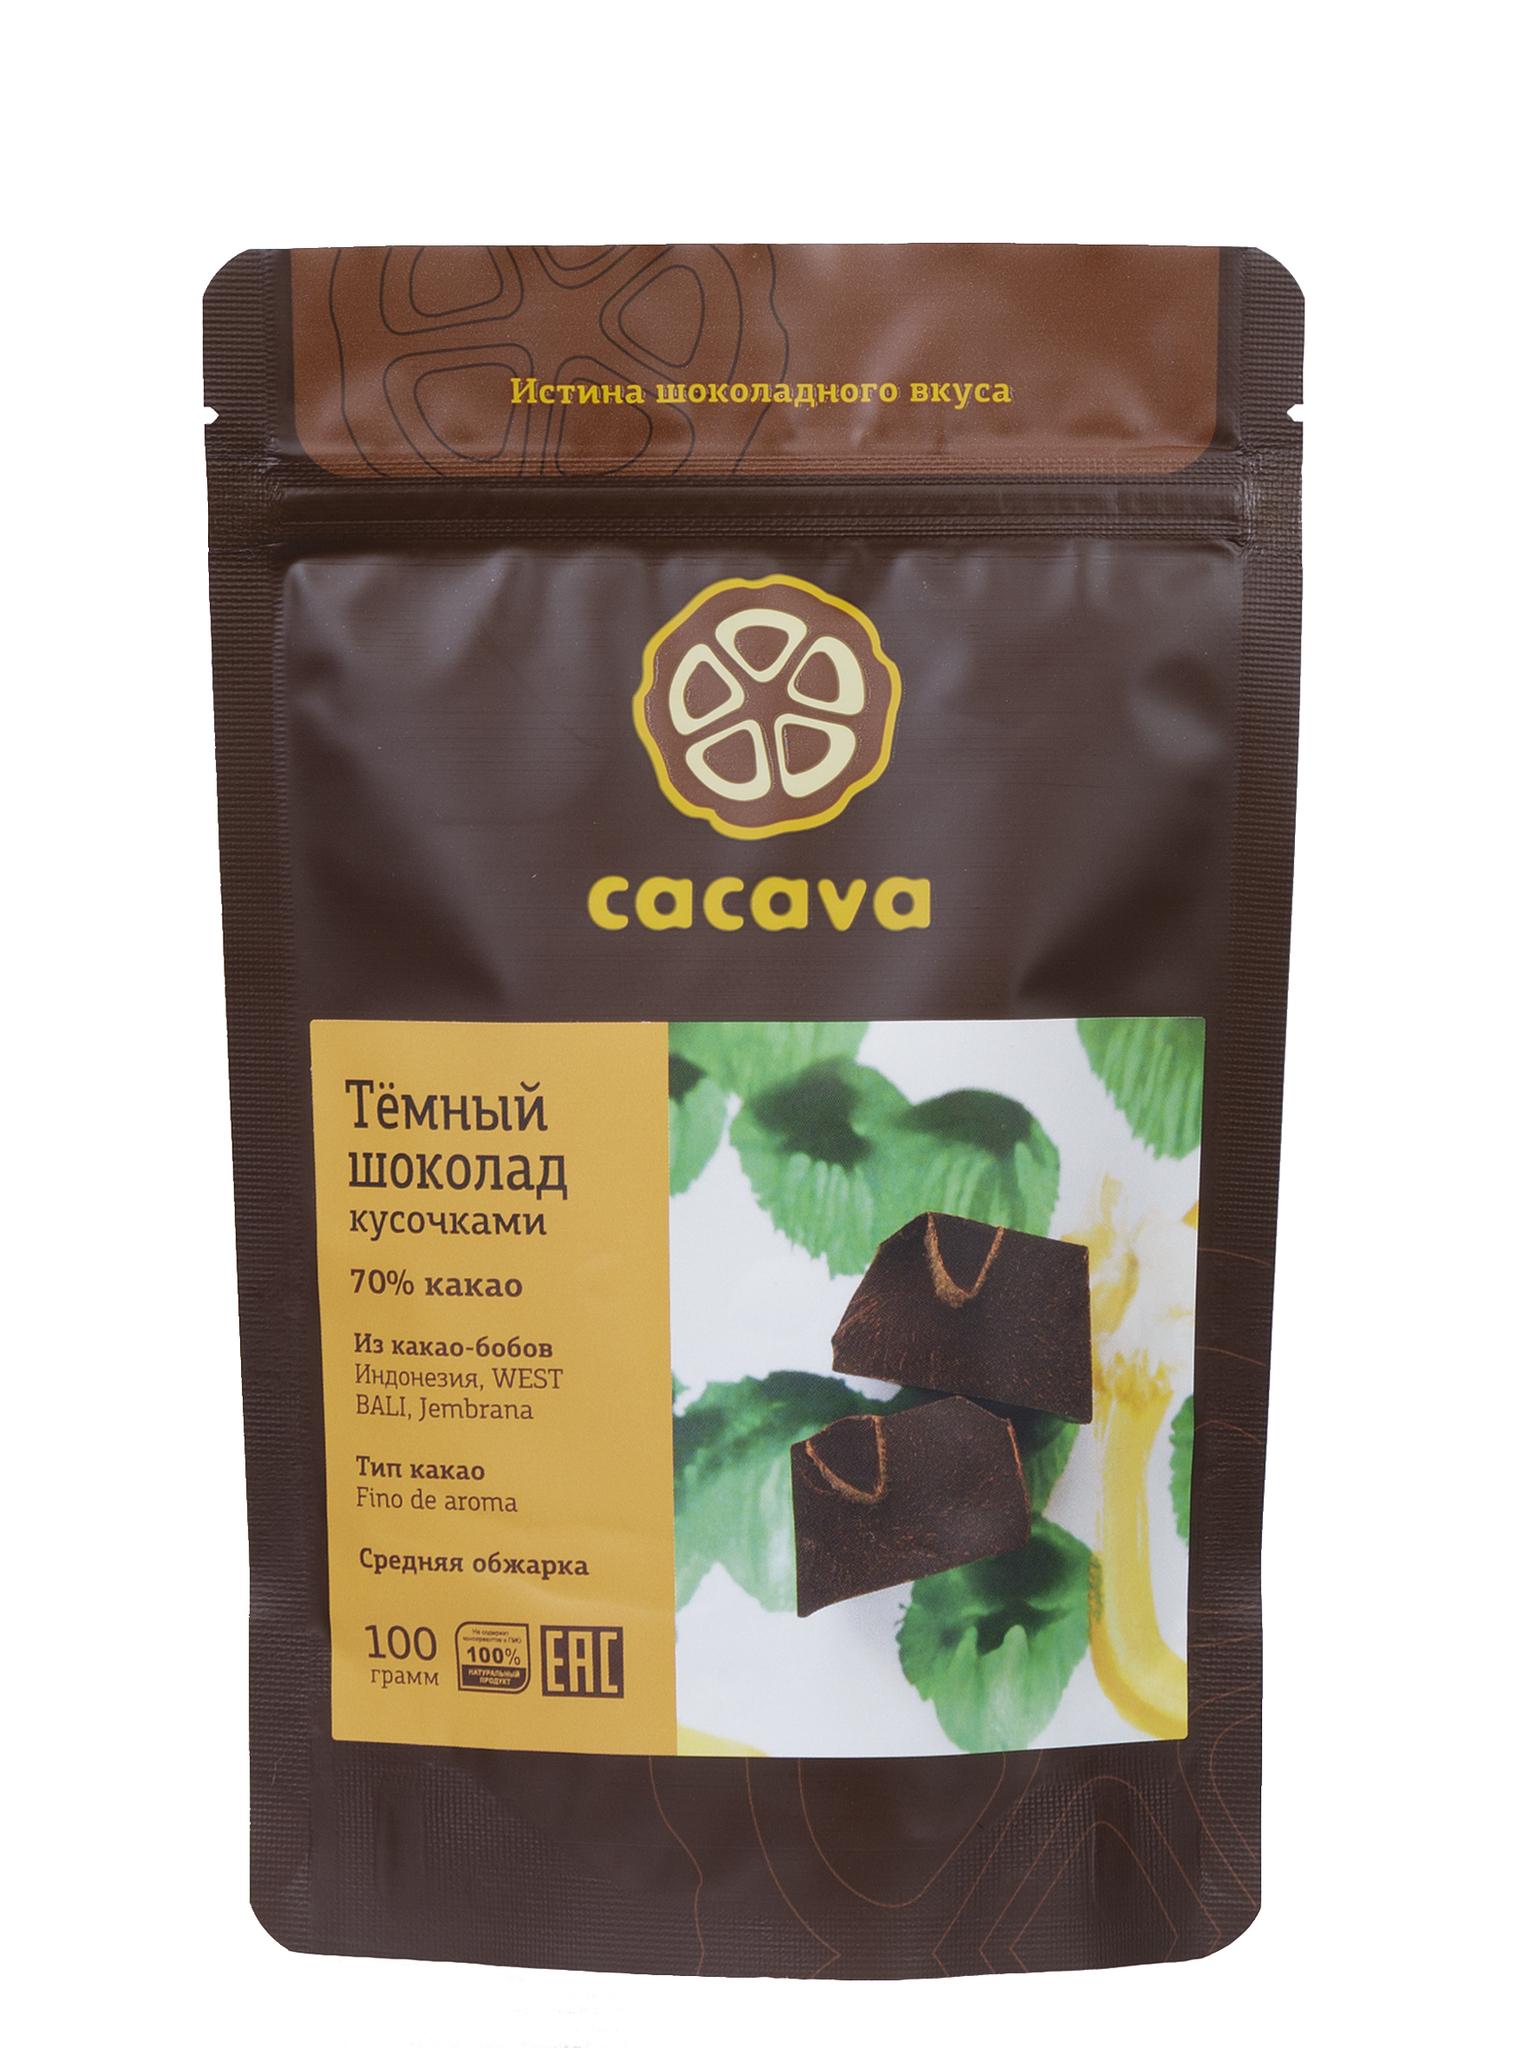 Тёмный шоколад 70 % какао (Индонезия, WEST BALI, Jembrana), упаковка 100 грамм